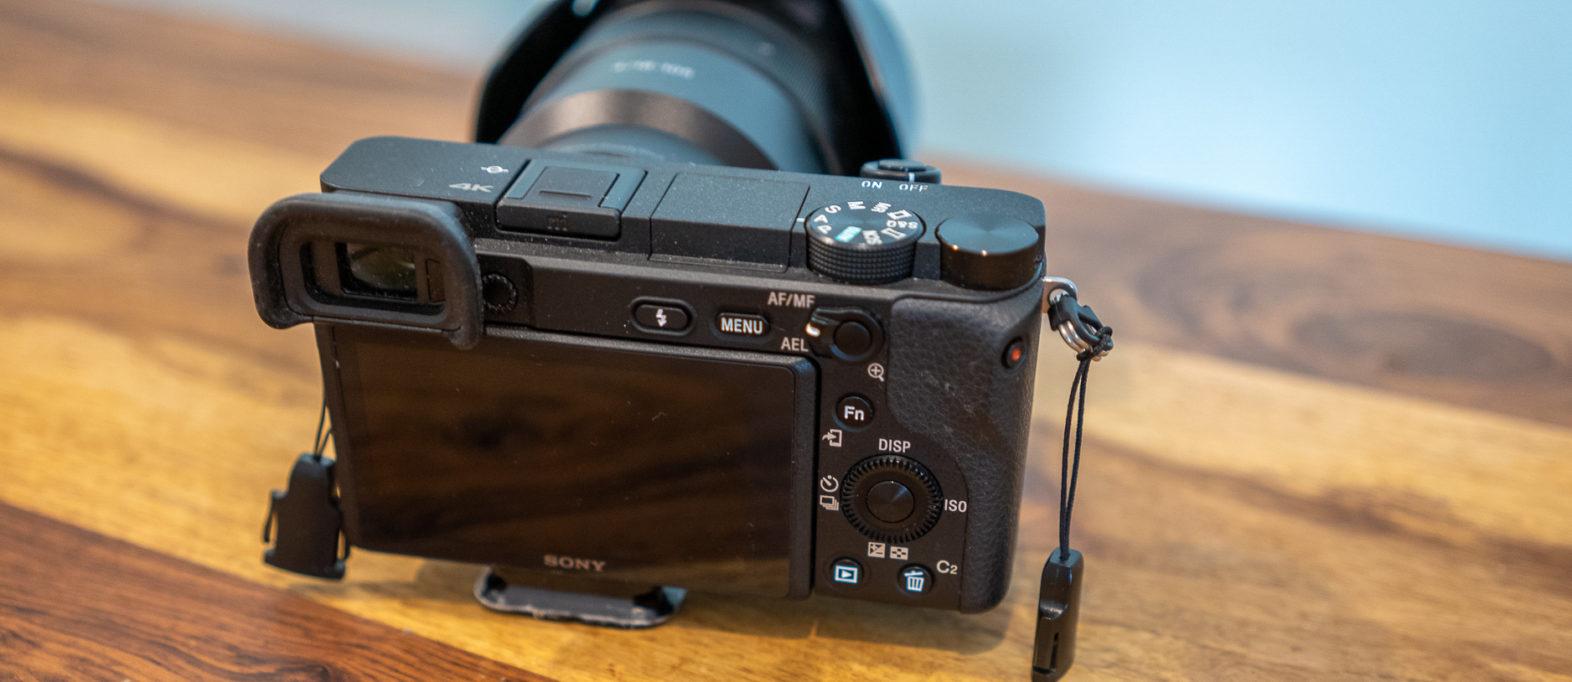 Sony Alpha 6000 Kamera Display Foto